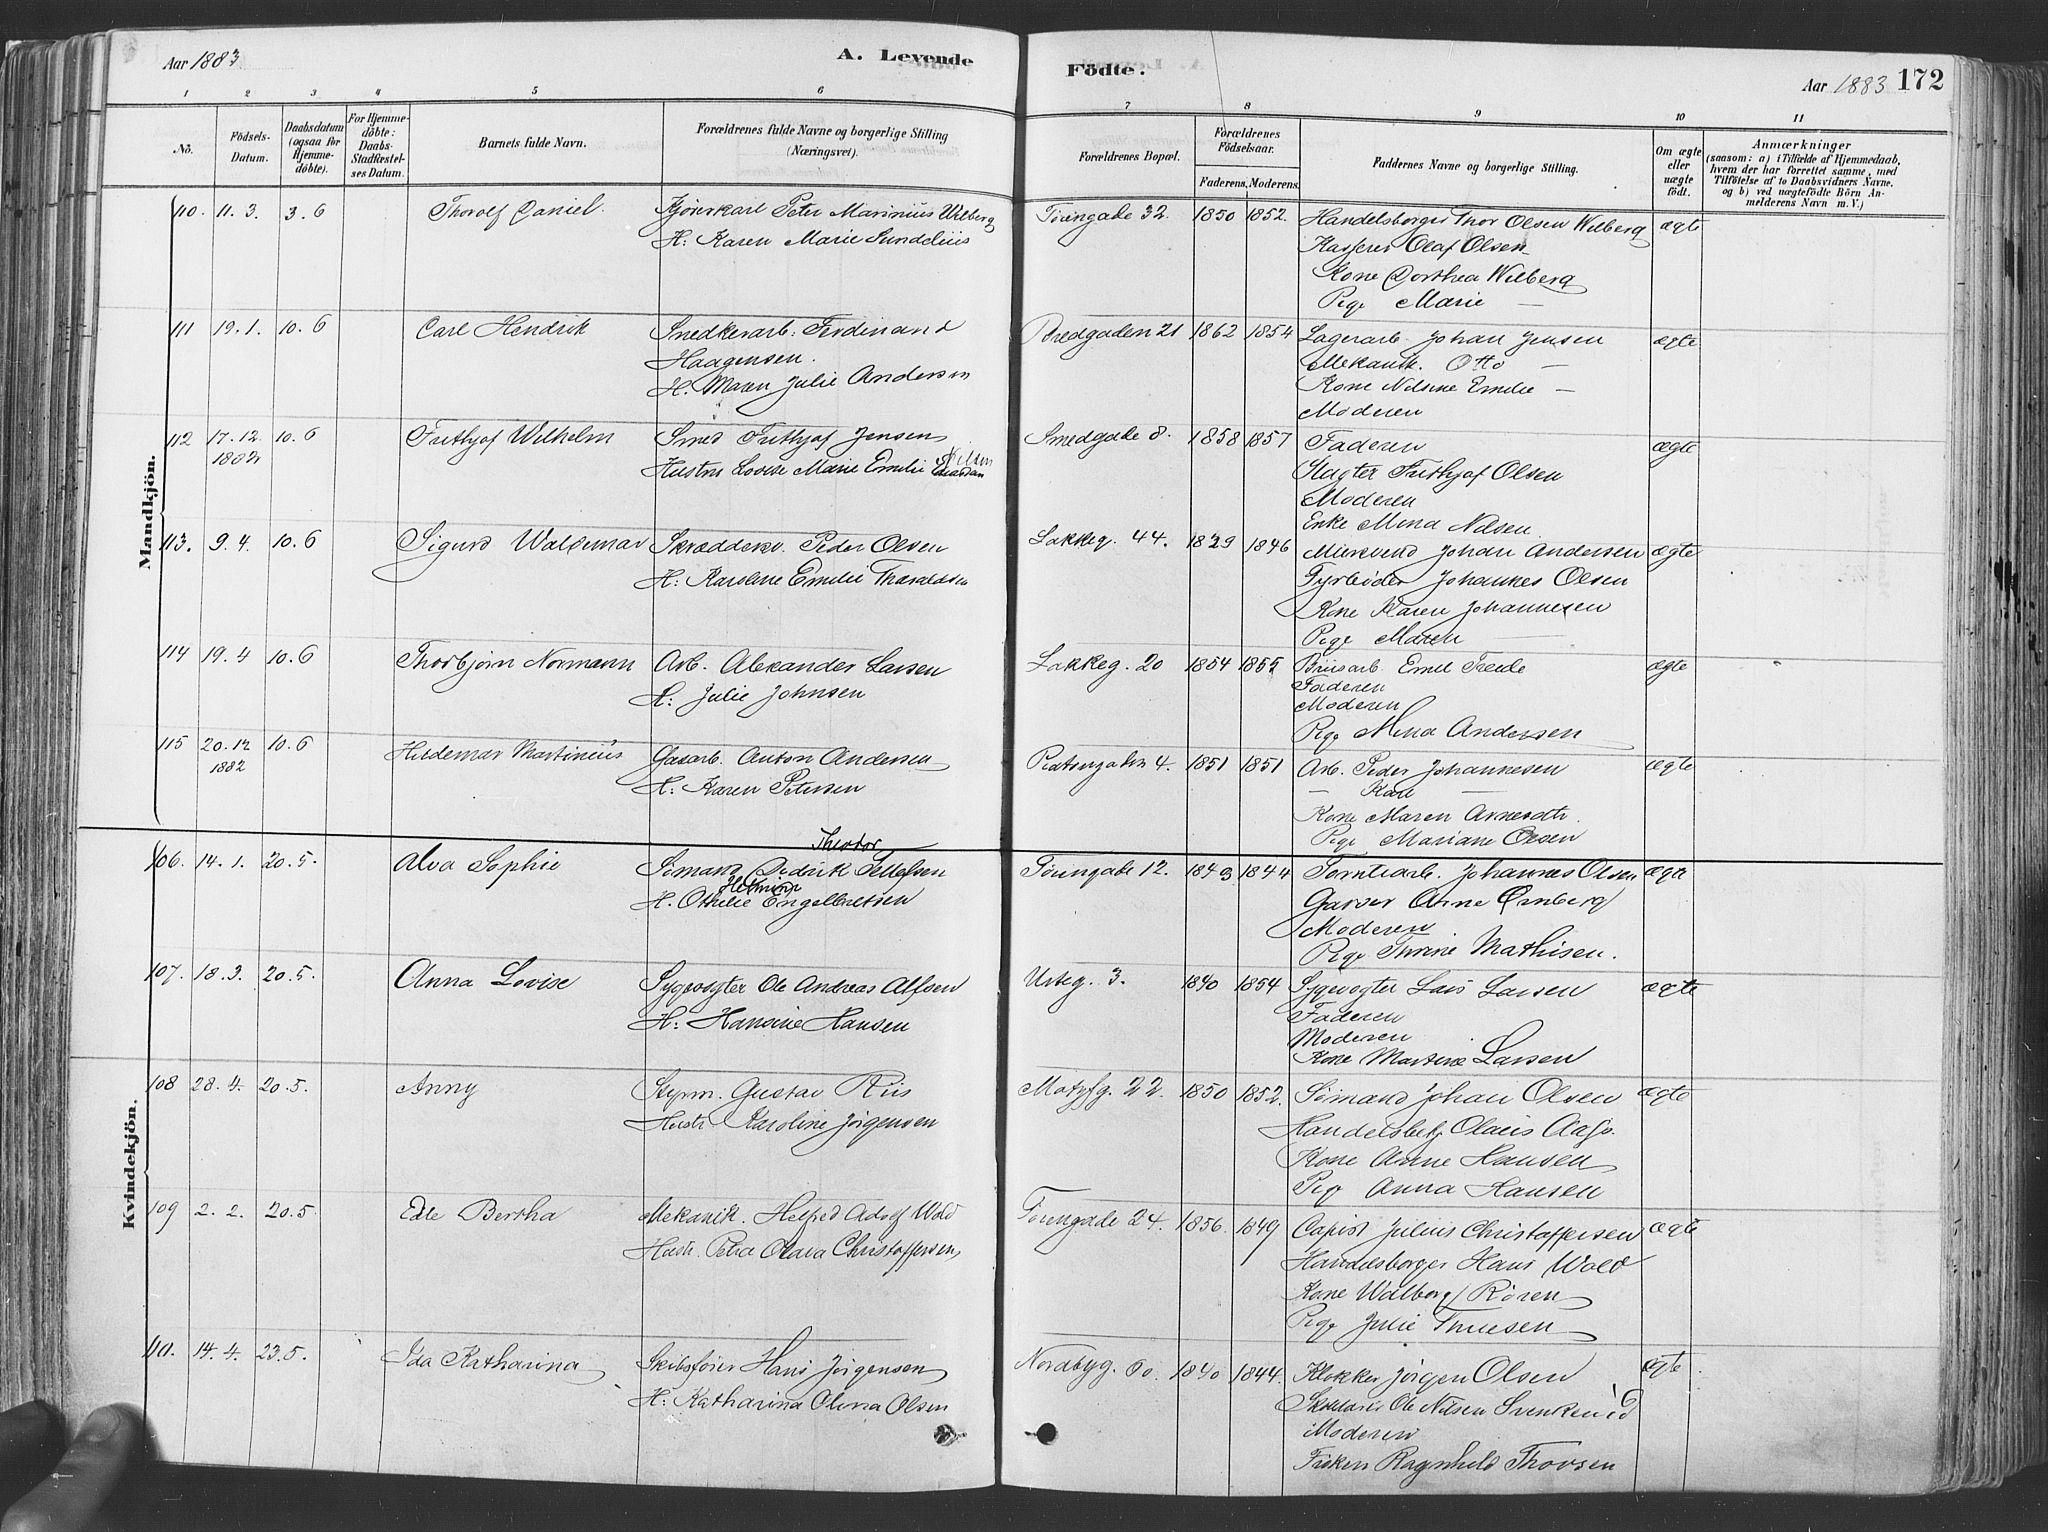 SAO, Grønland prestekontor Kirkebøker, F/Fa/L0007: Ministerialbok nr. 7, 1878-1888, s. 172